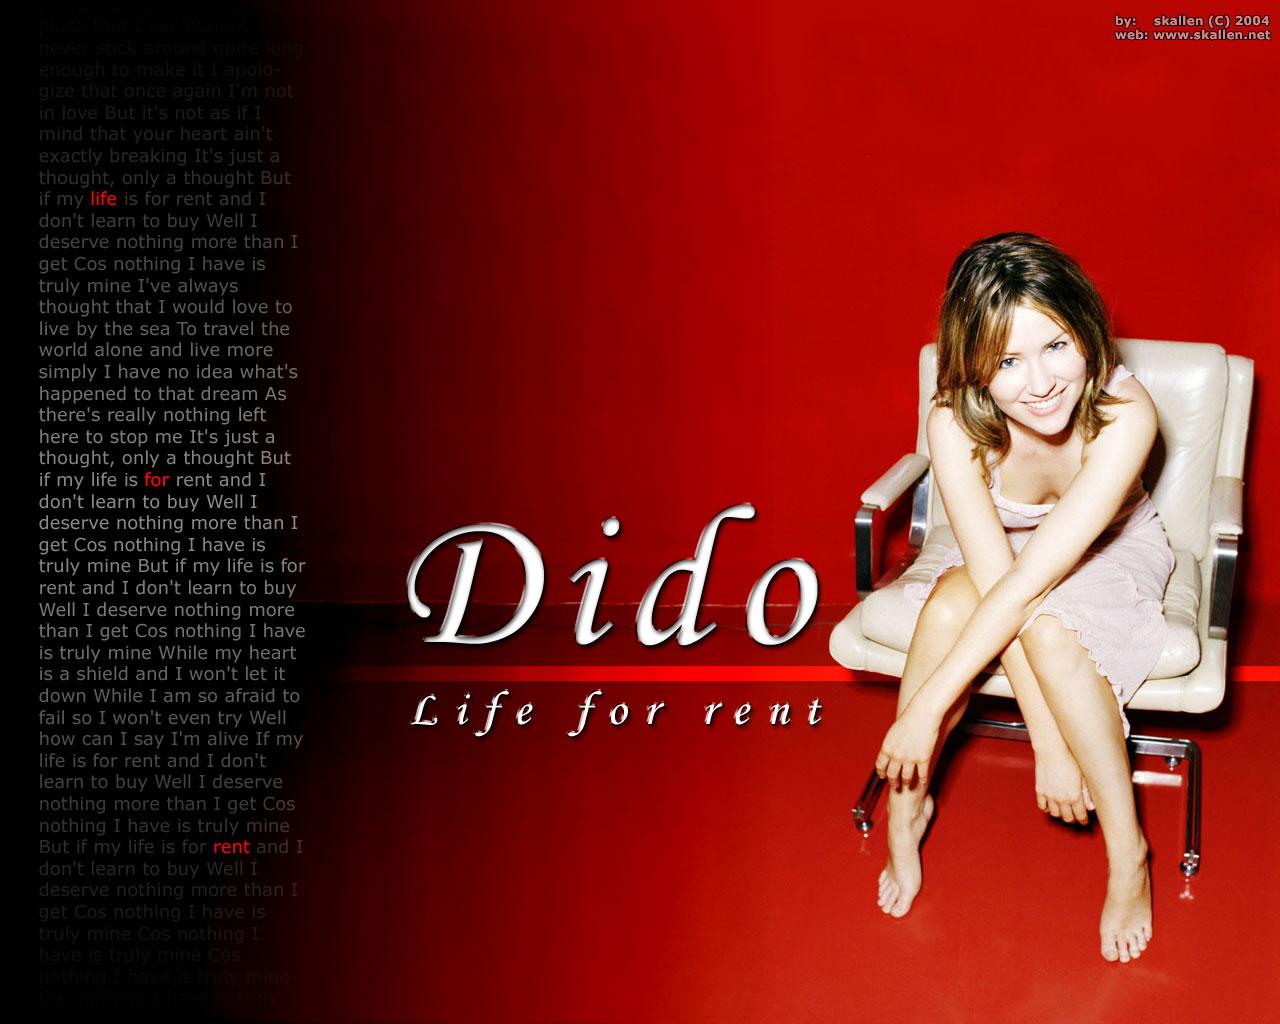 http://4.bp.blogspot.com/-wZLC32TjoEA/UL1z-uc_BOI/AAAAAAAAOU4/-C4VCVCcbdI/s1600/dido_wallpaper_3.jpg